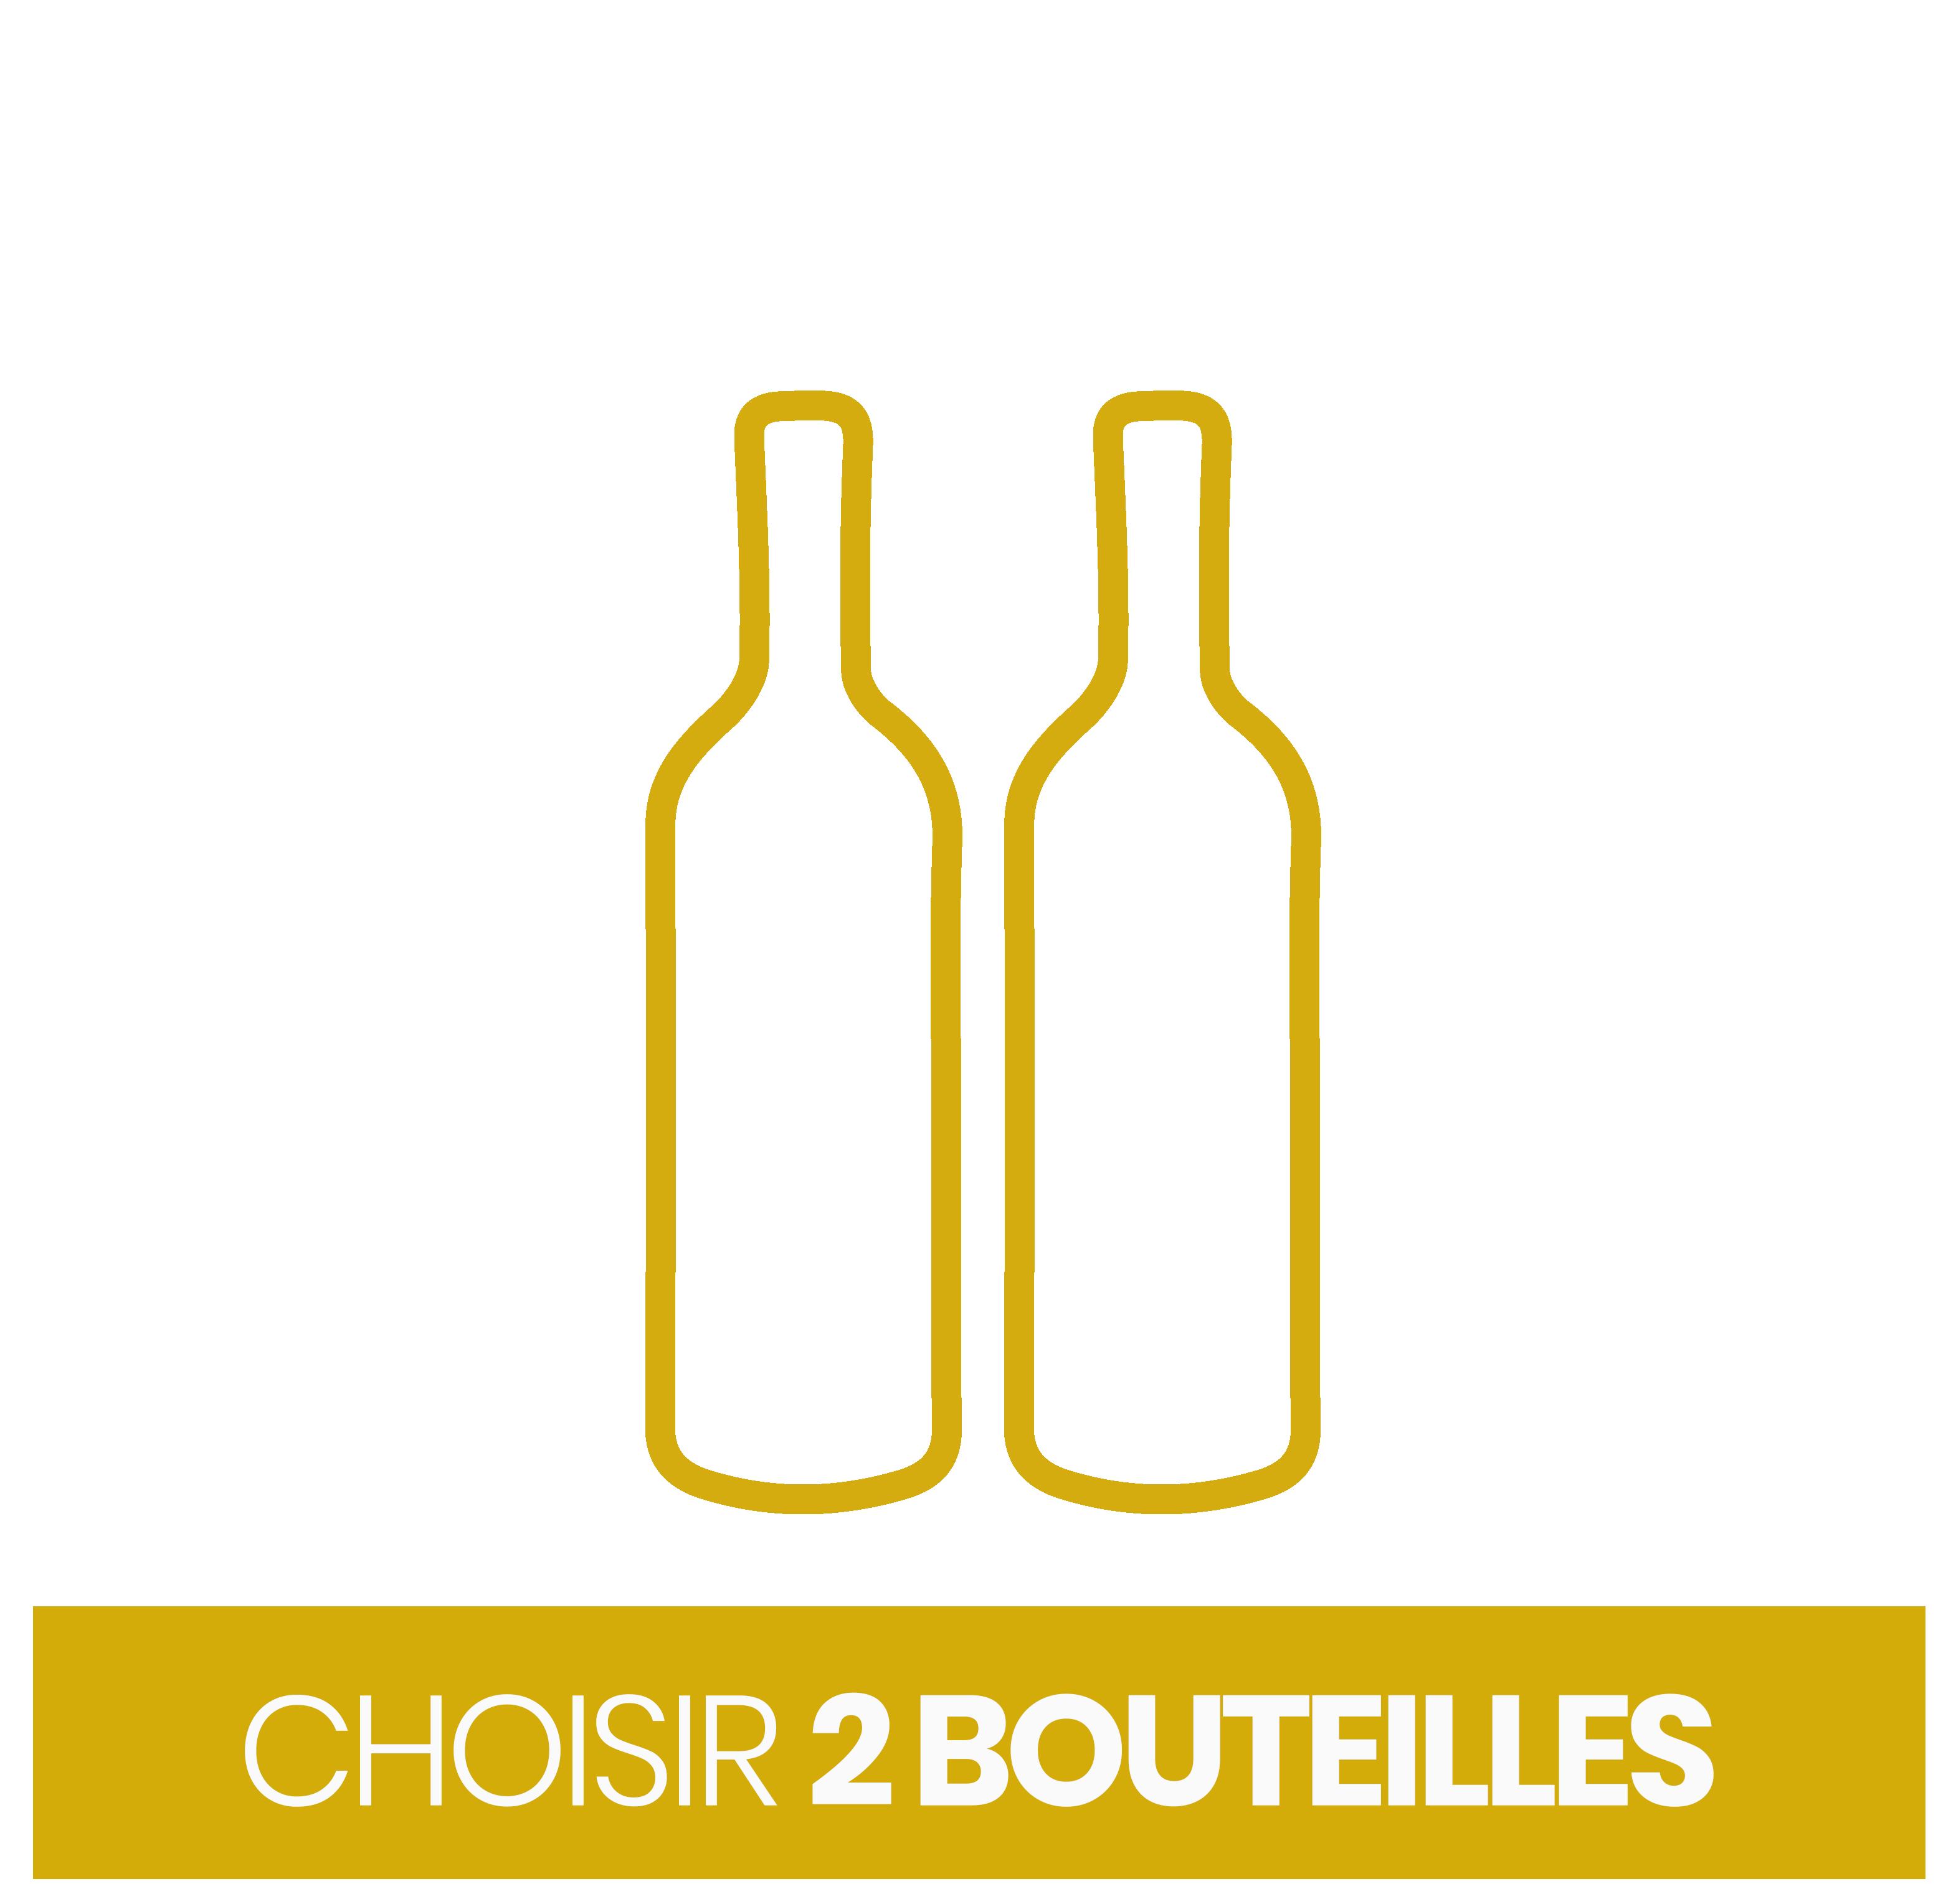 Choisir 2 bouteilles